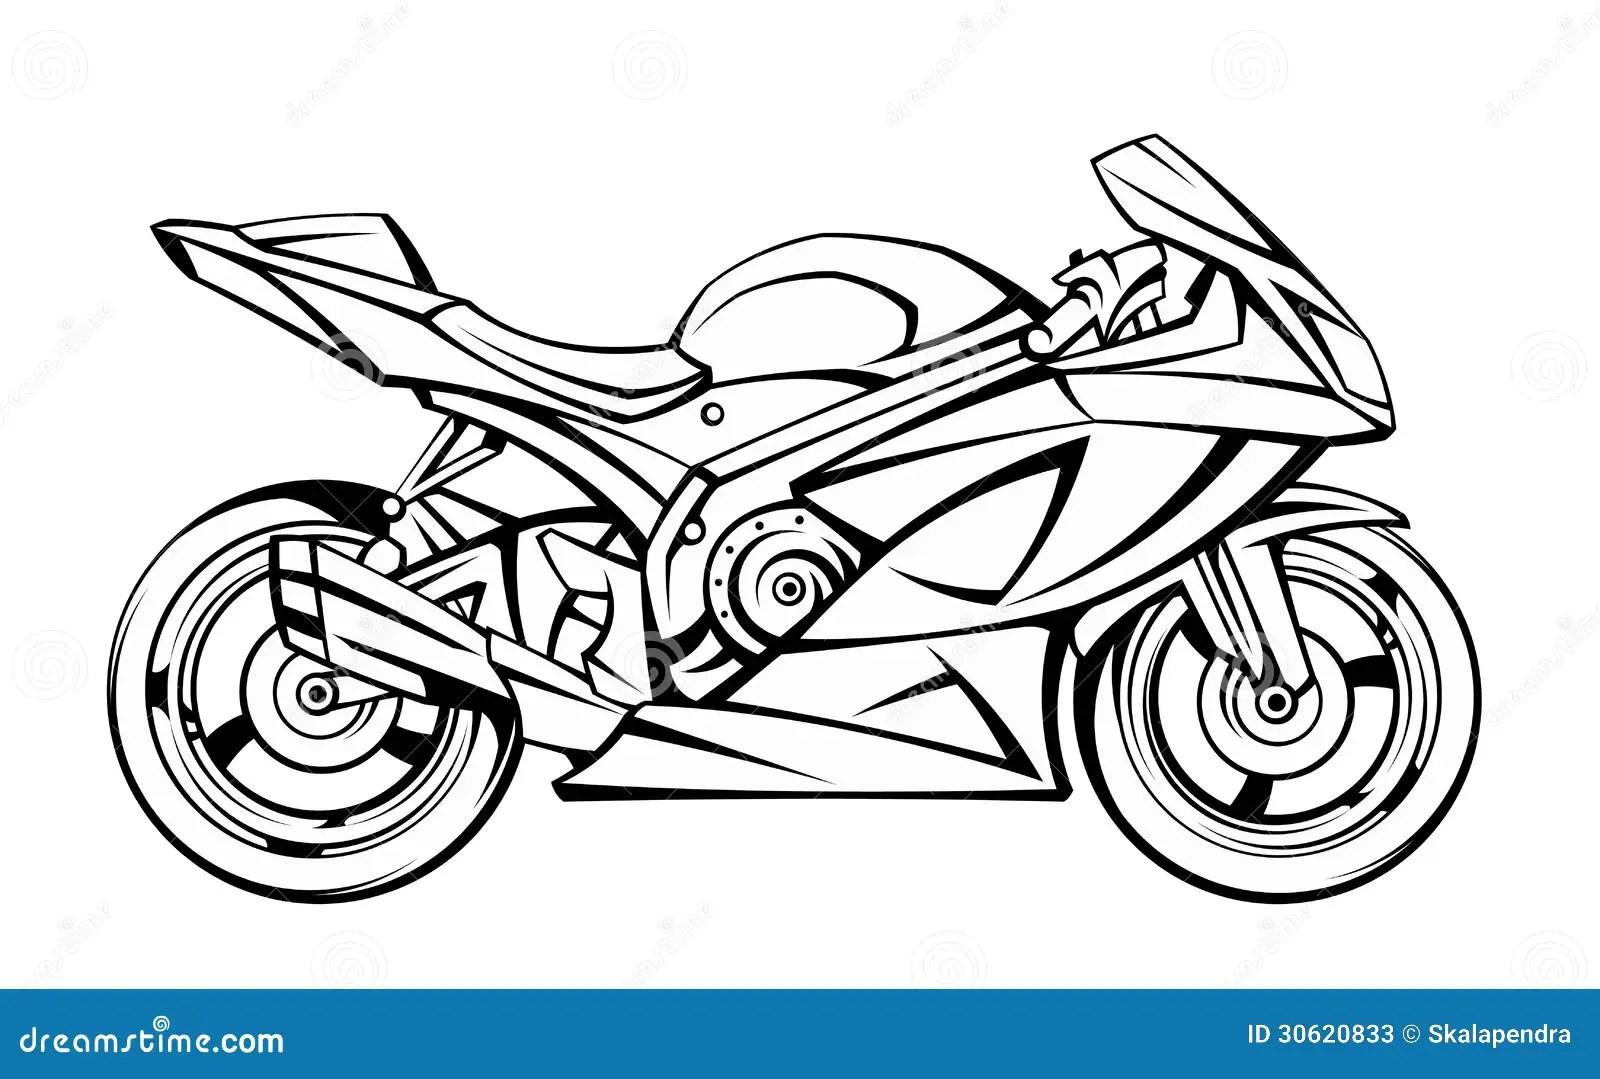 Motorrad Vektor Abbildung Illustration Von Leistungsfahig